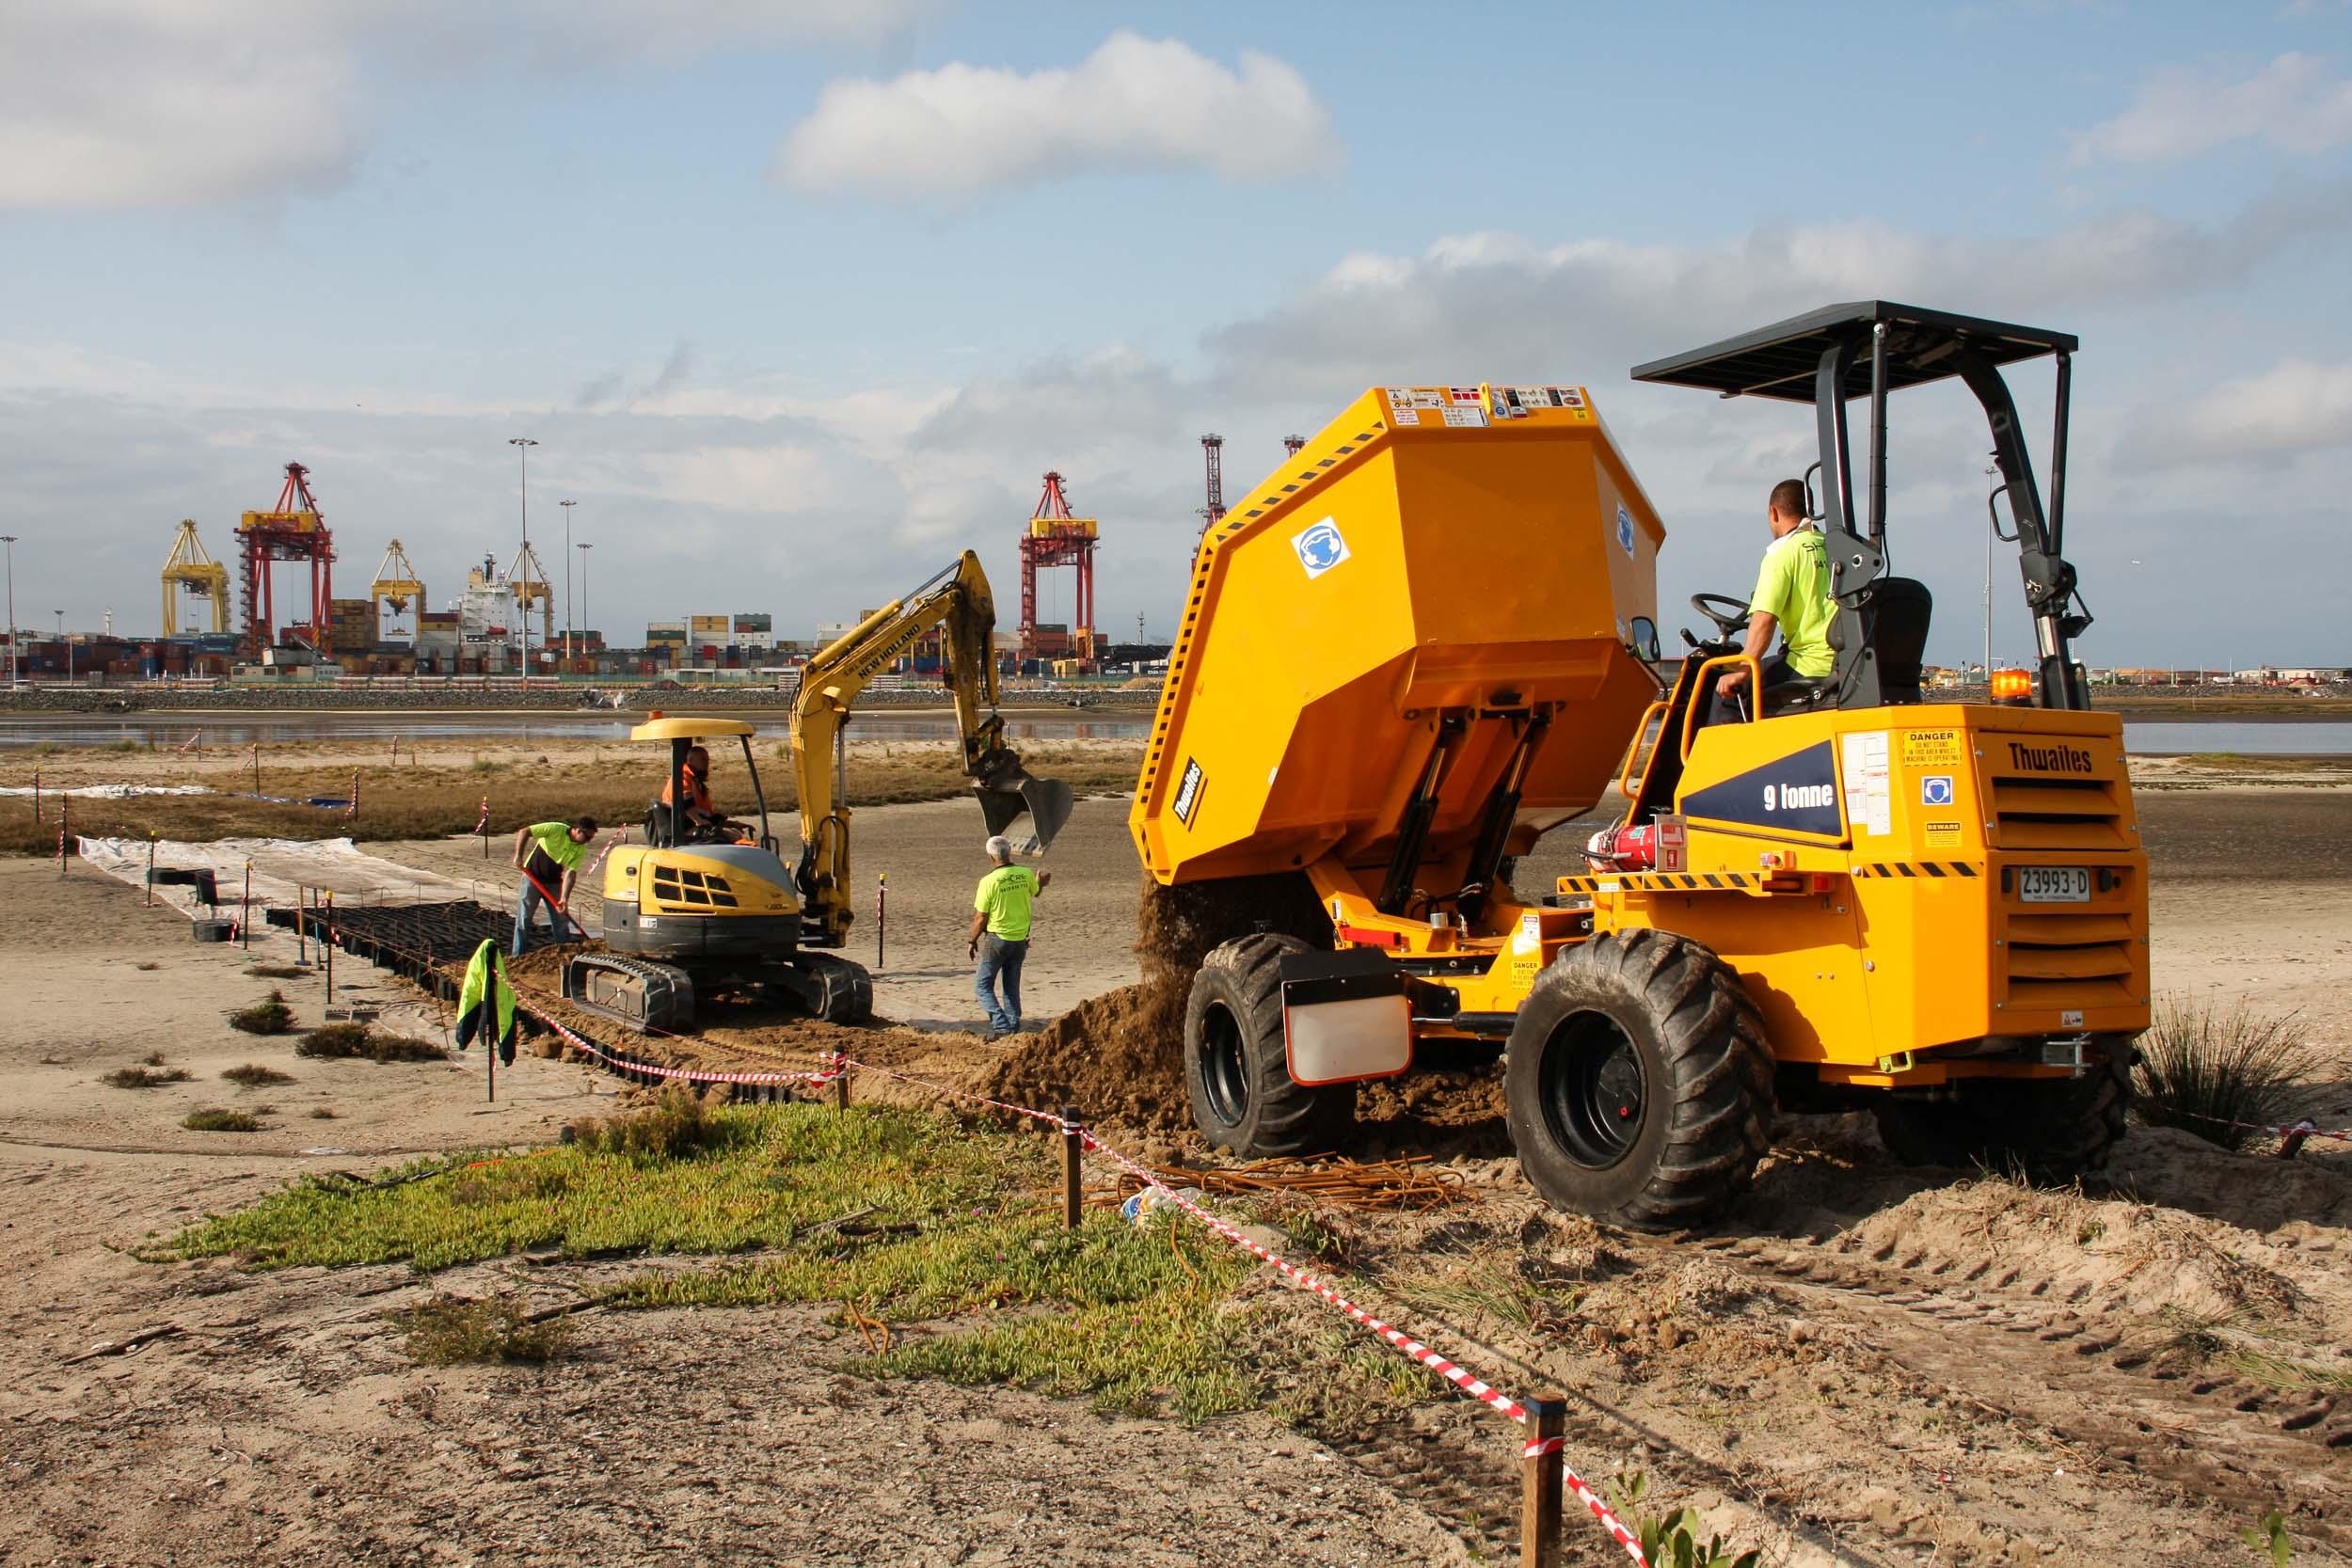 NSW civil construction company